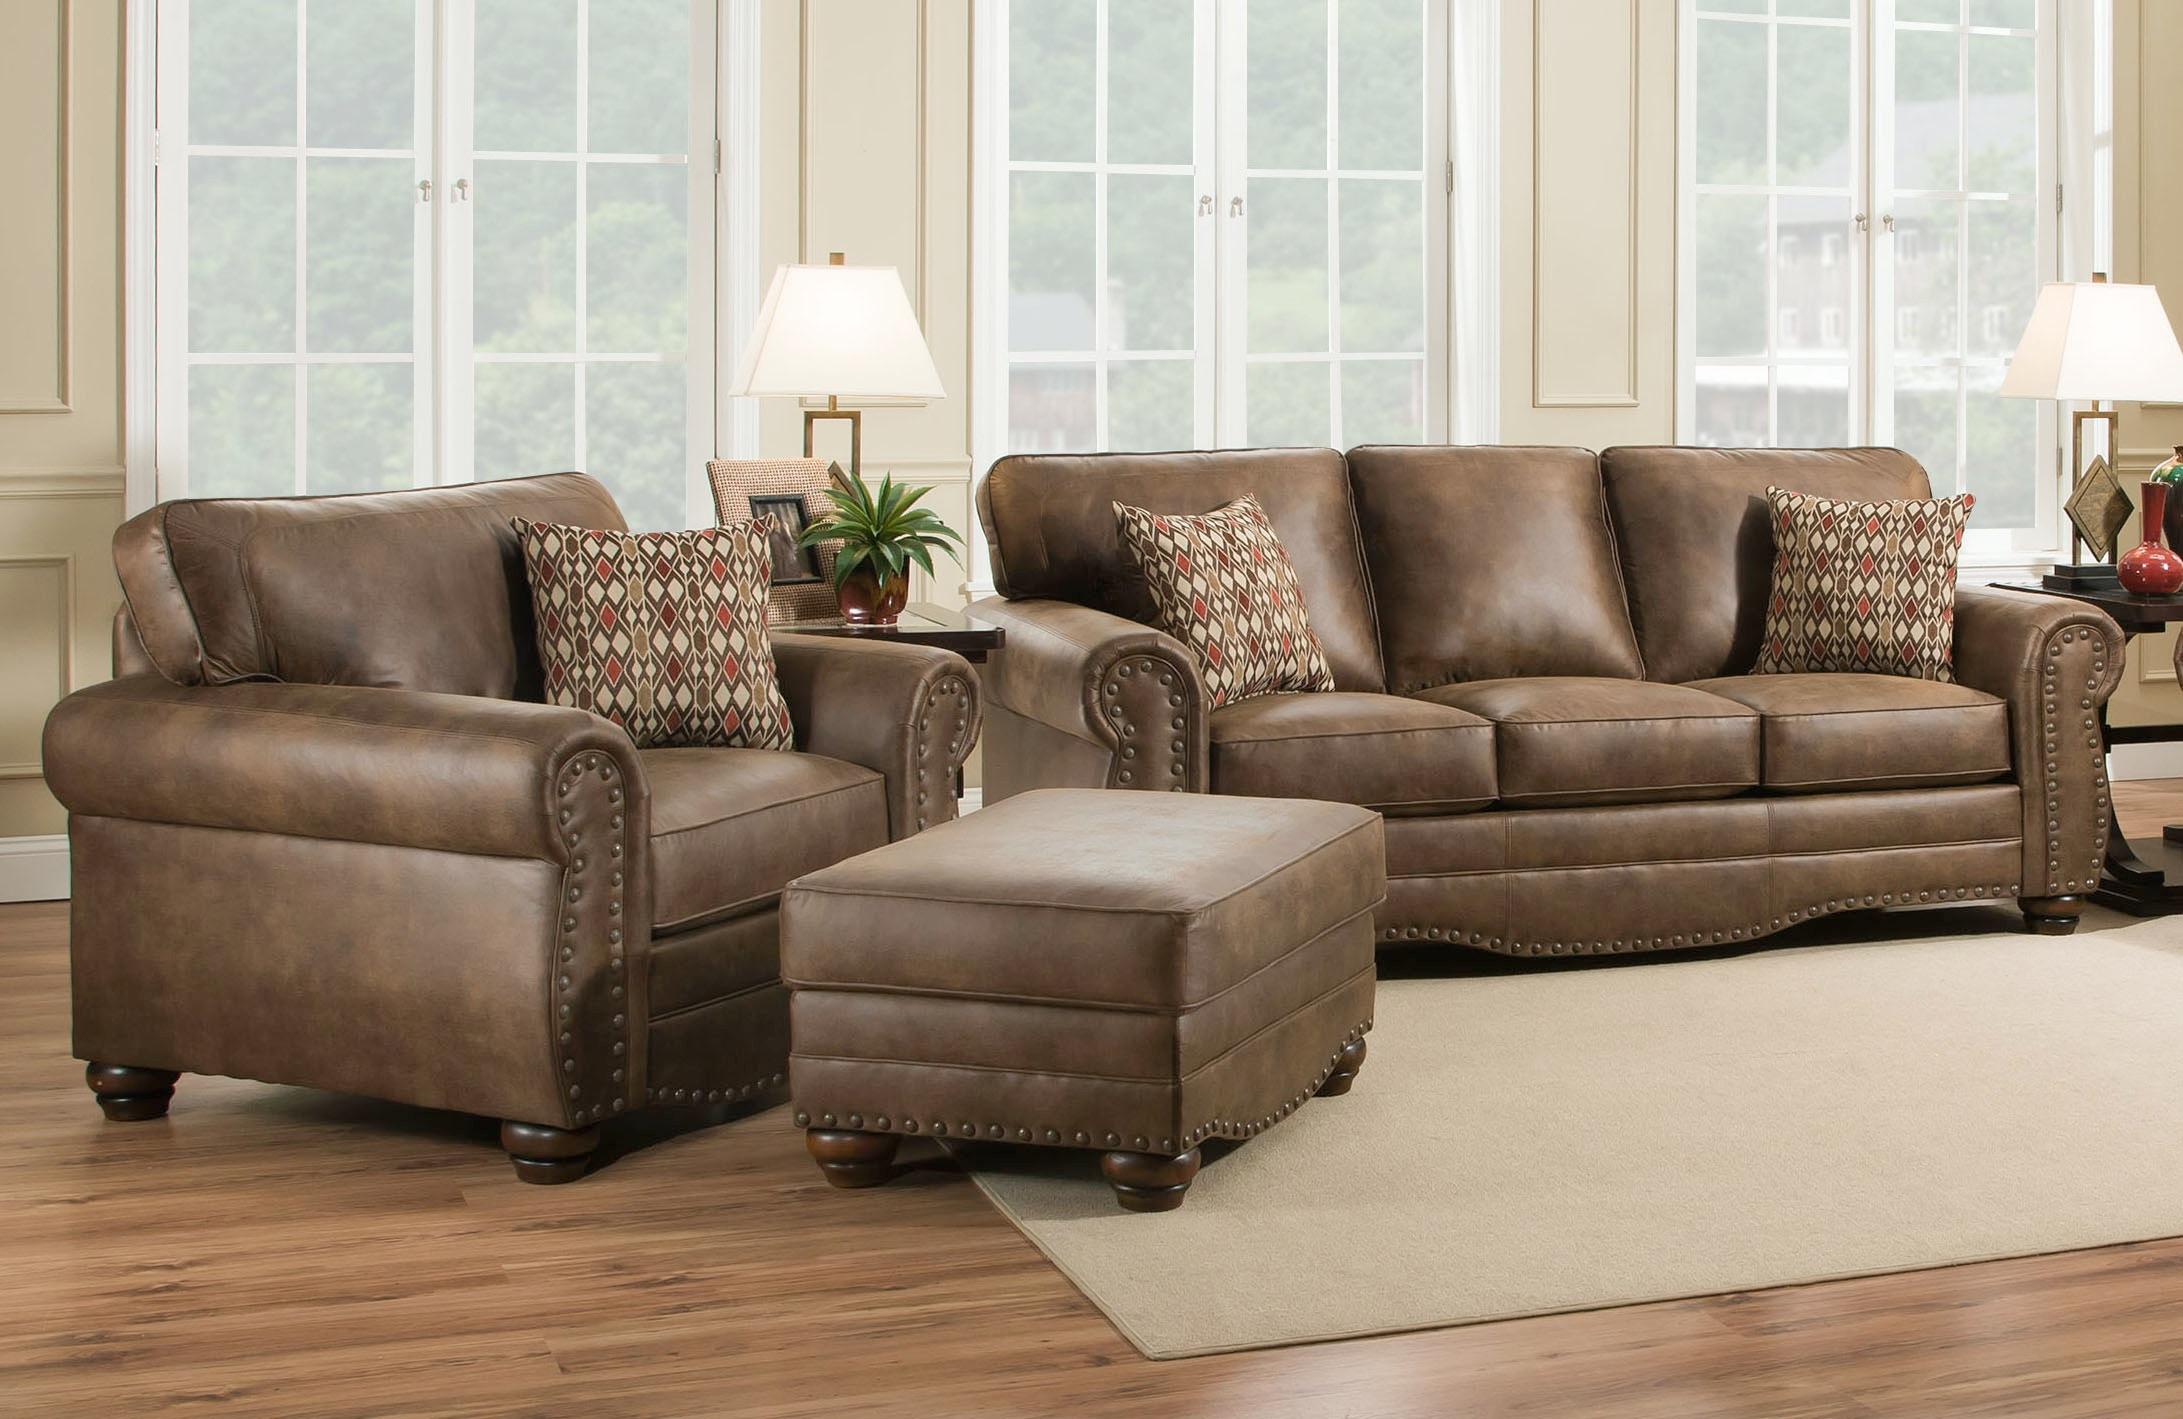 living room sets houston texas. sawyer 3-piece living room set - tobacco sets houston texas